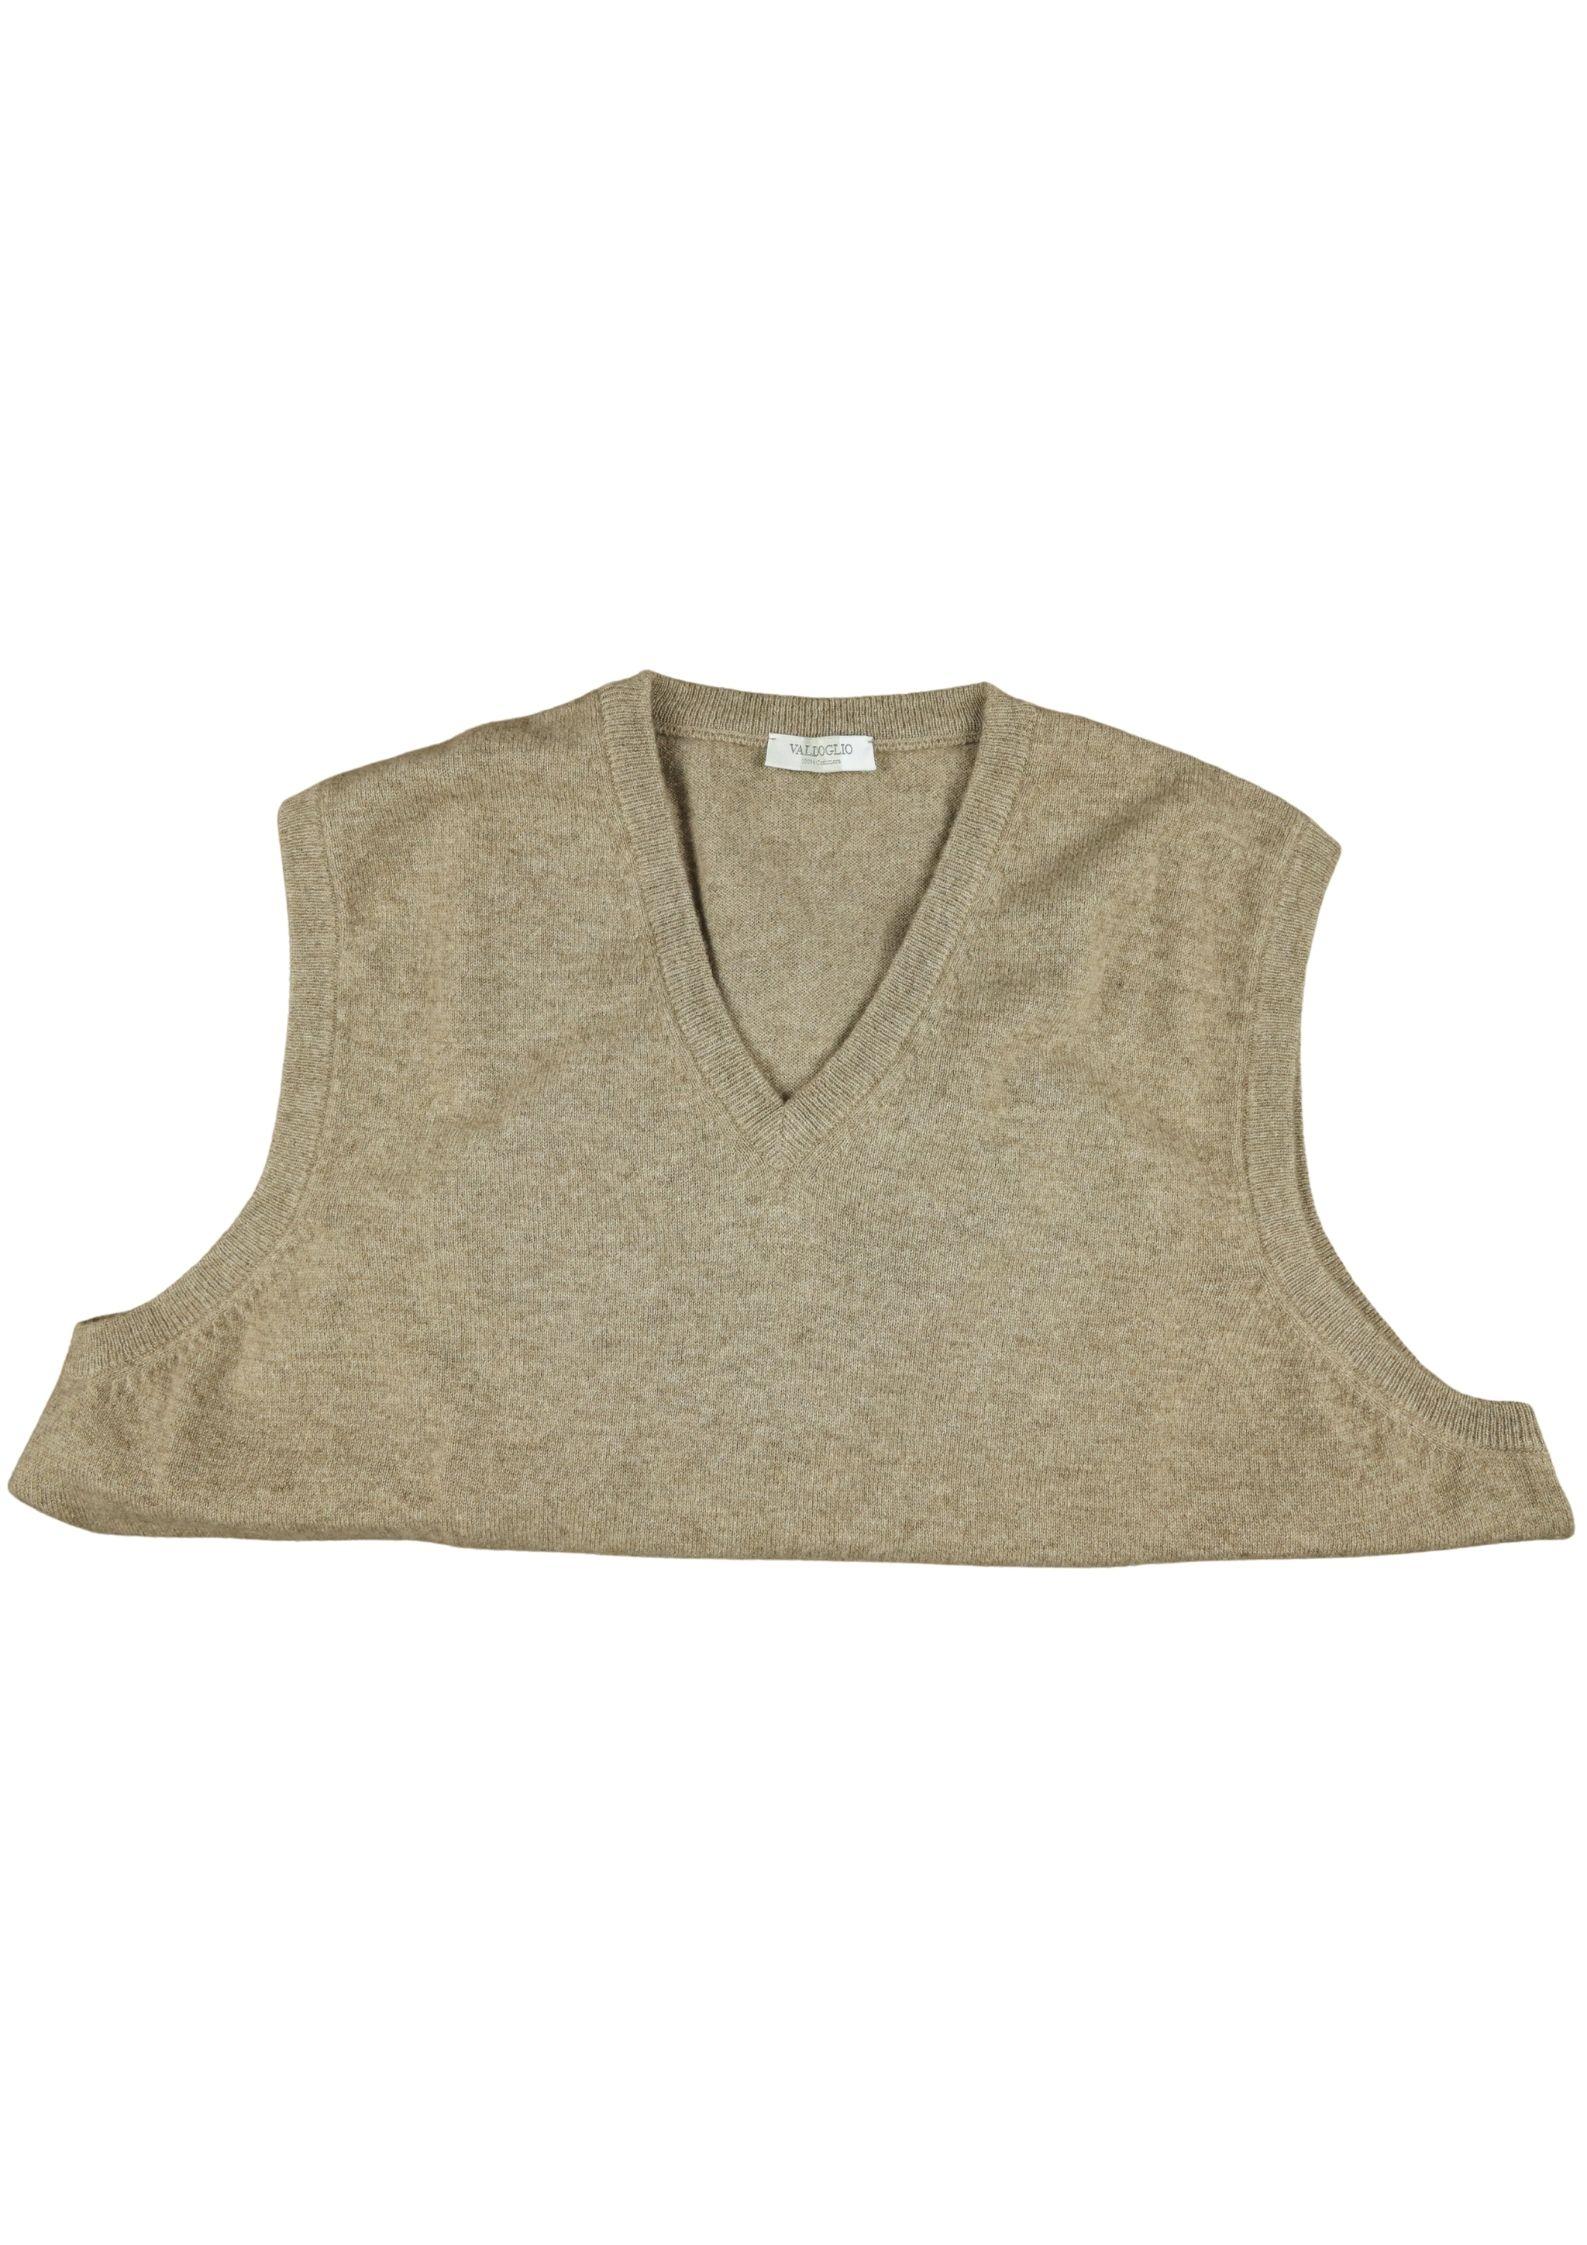 VALDOGLIO | Knitwear | 503A265